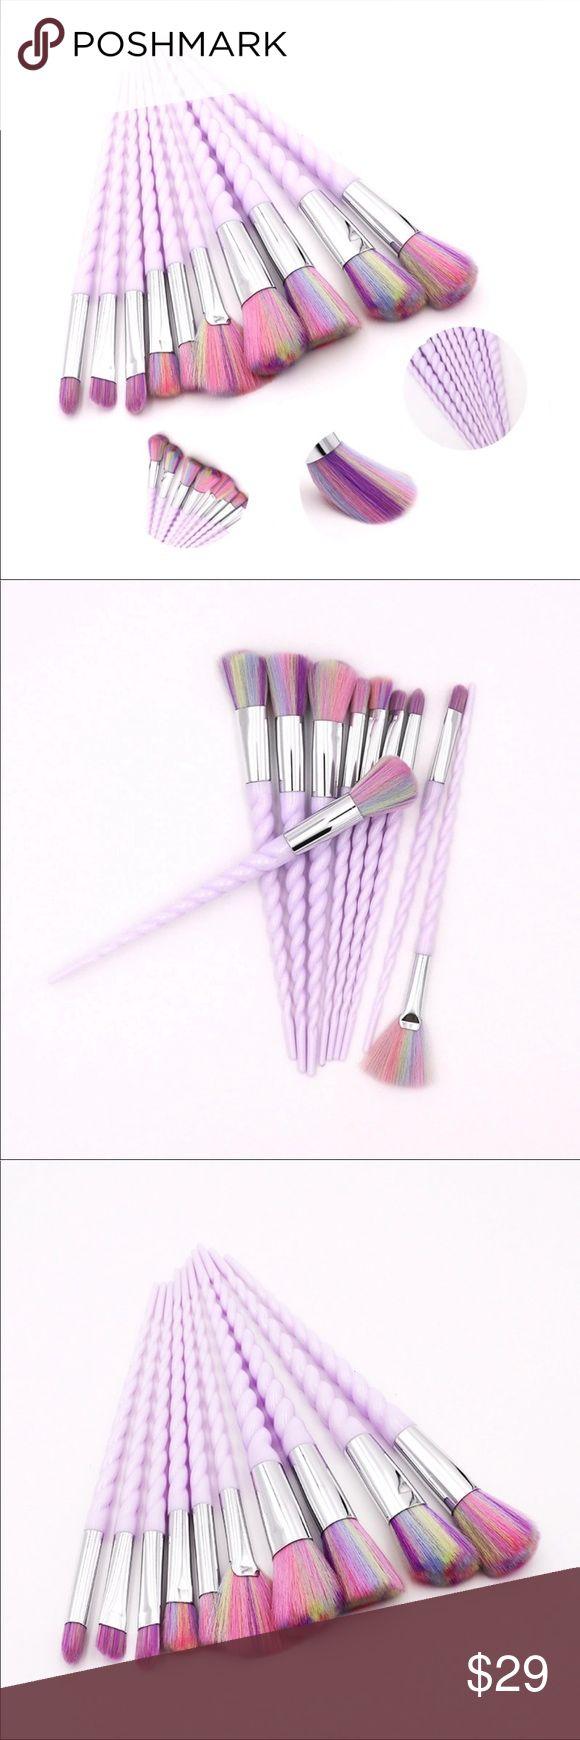 10 pcs Makeup Brushes Set Professional Make-up Brushes Set 10 pcs  Handle Materi…